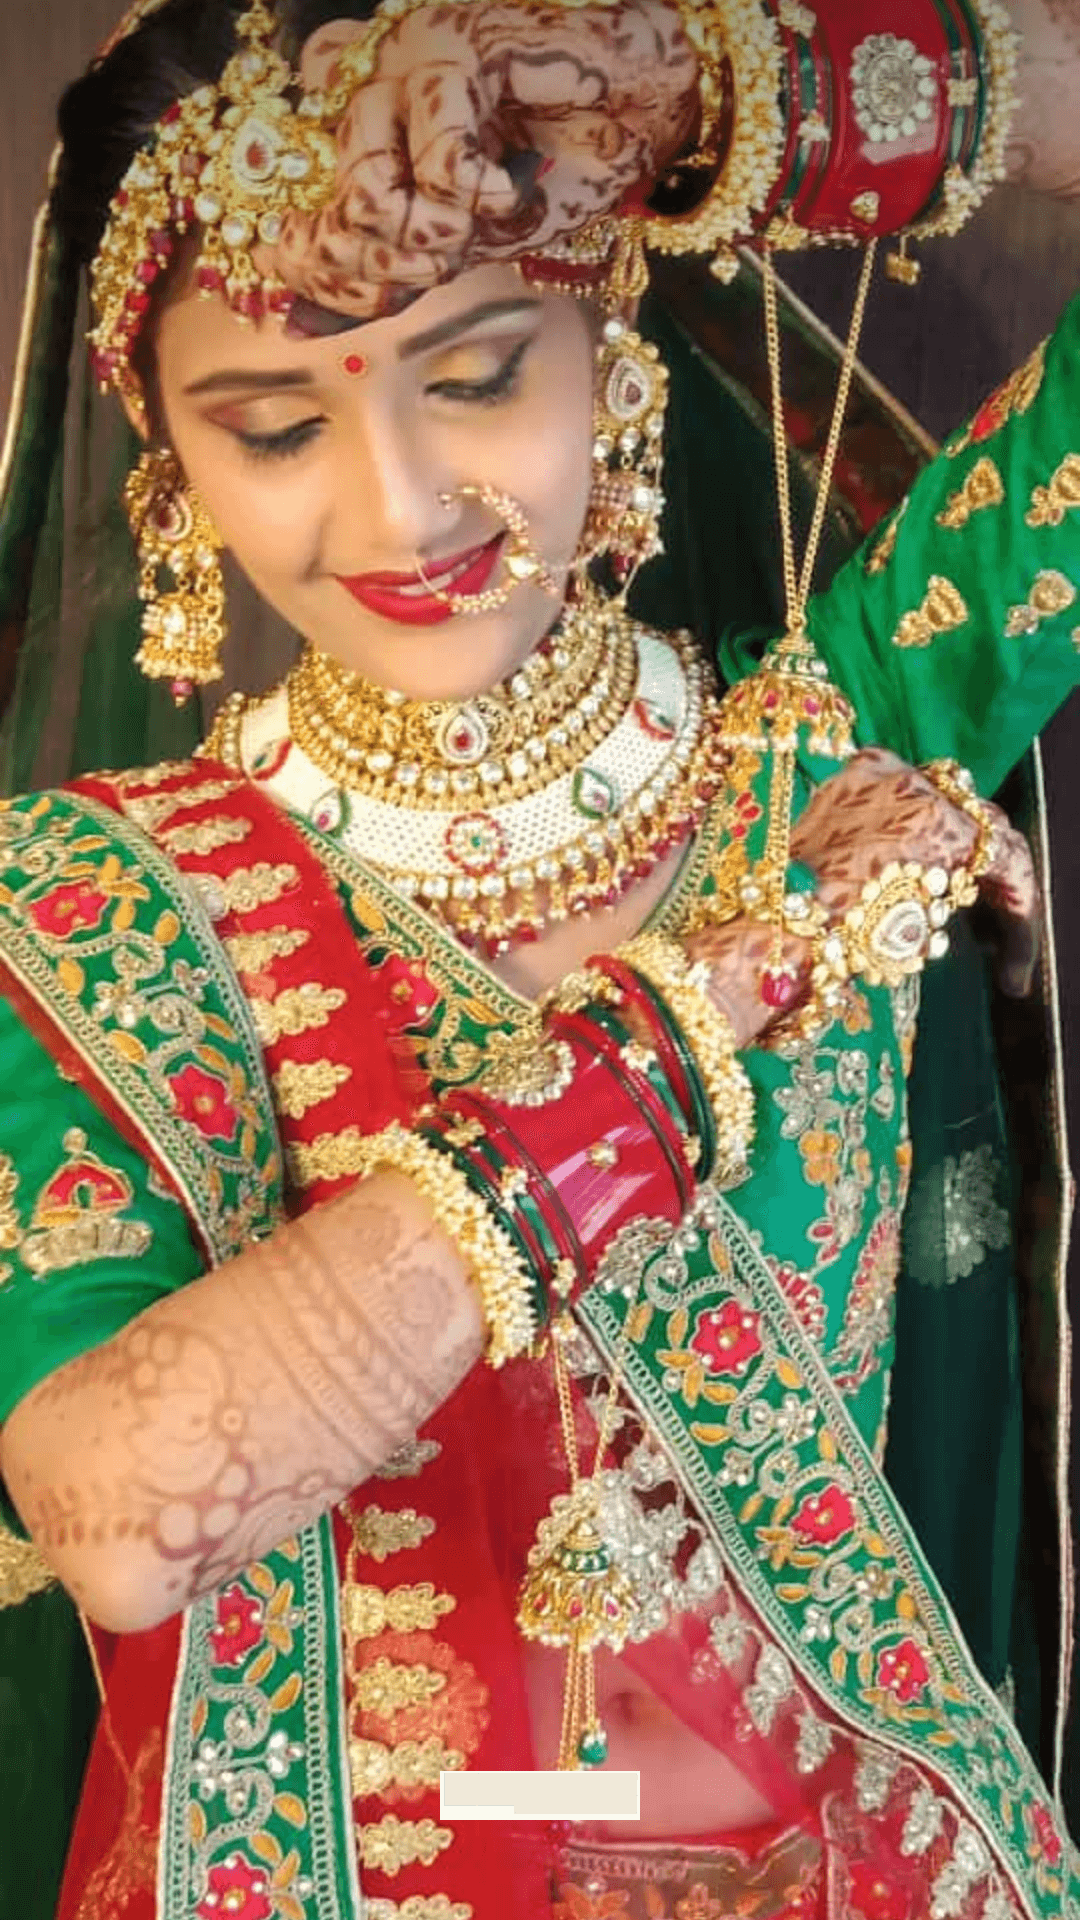 Anita Hairstyle And Makeup Artist